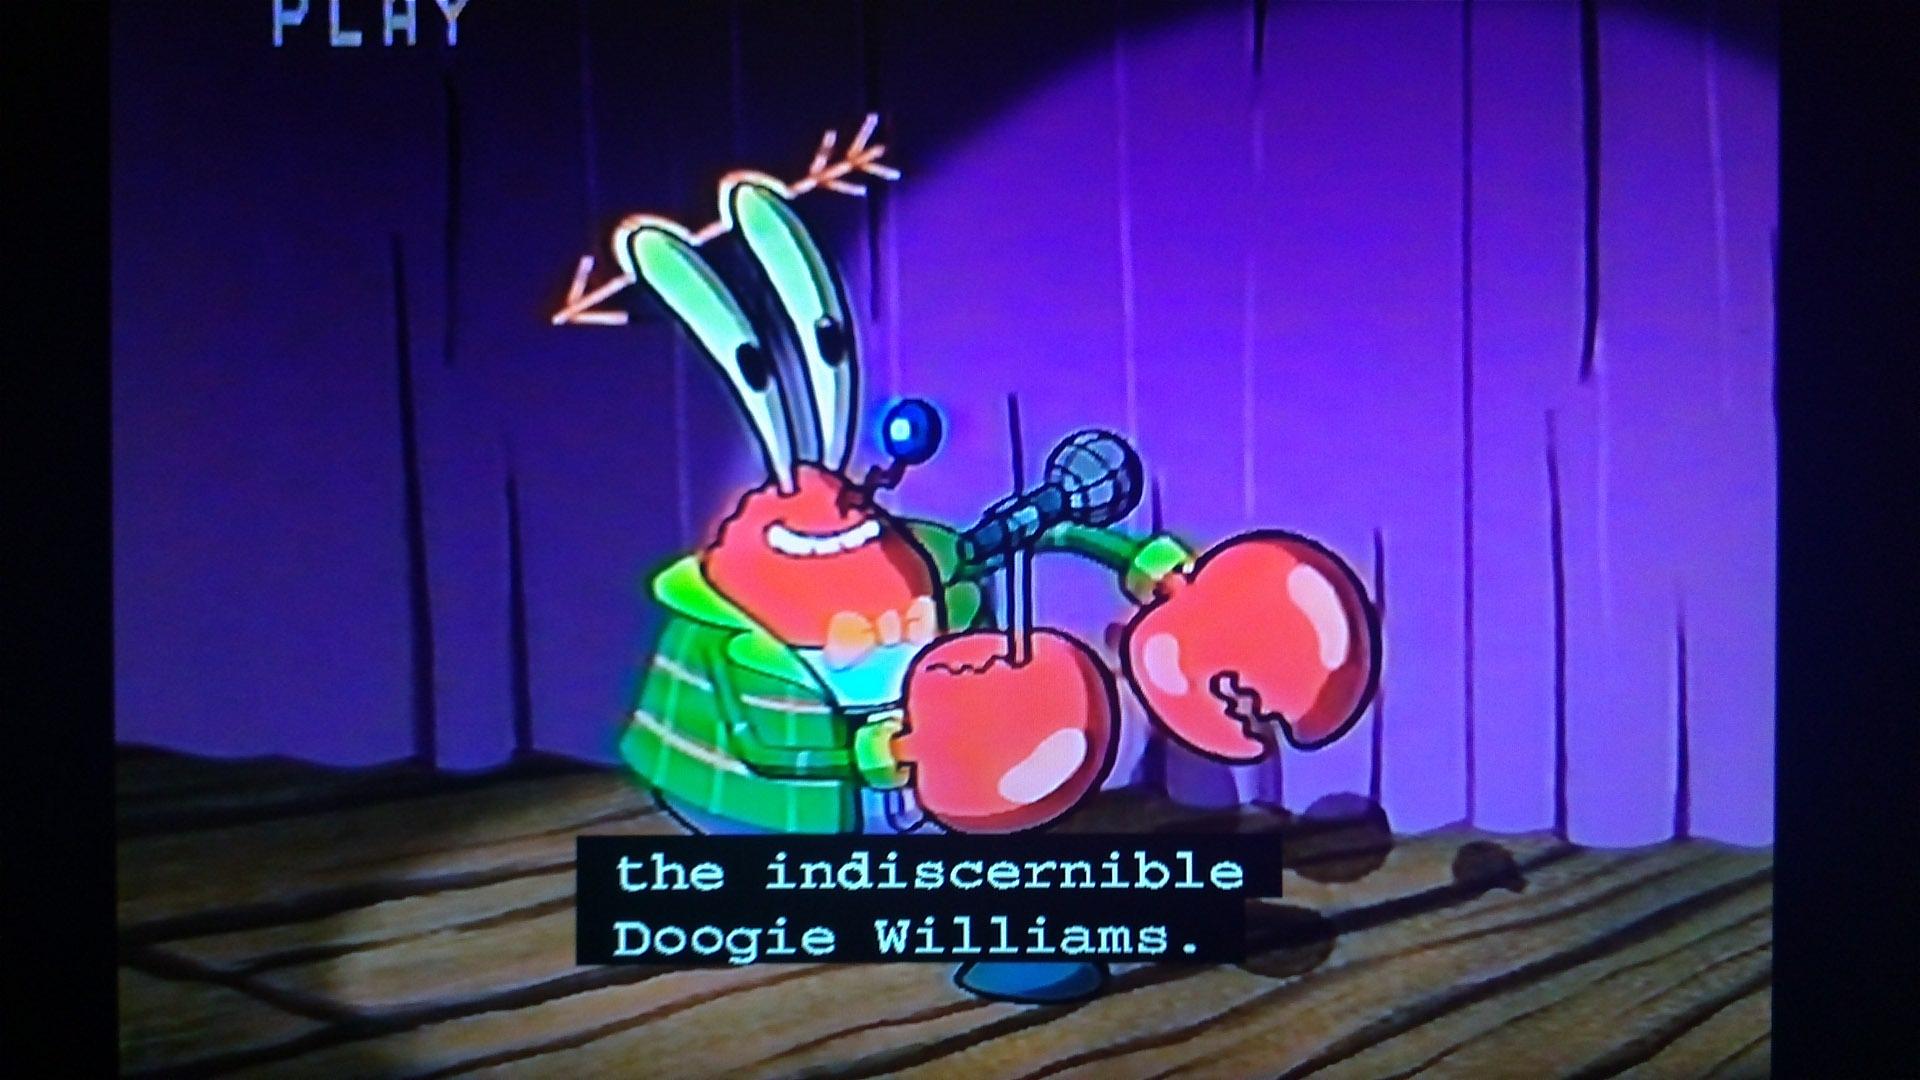 Australia dating 2019 memes spongebob chocolate